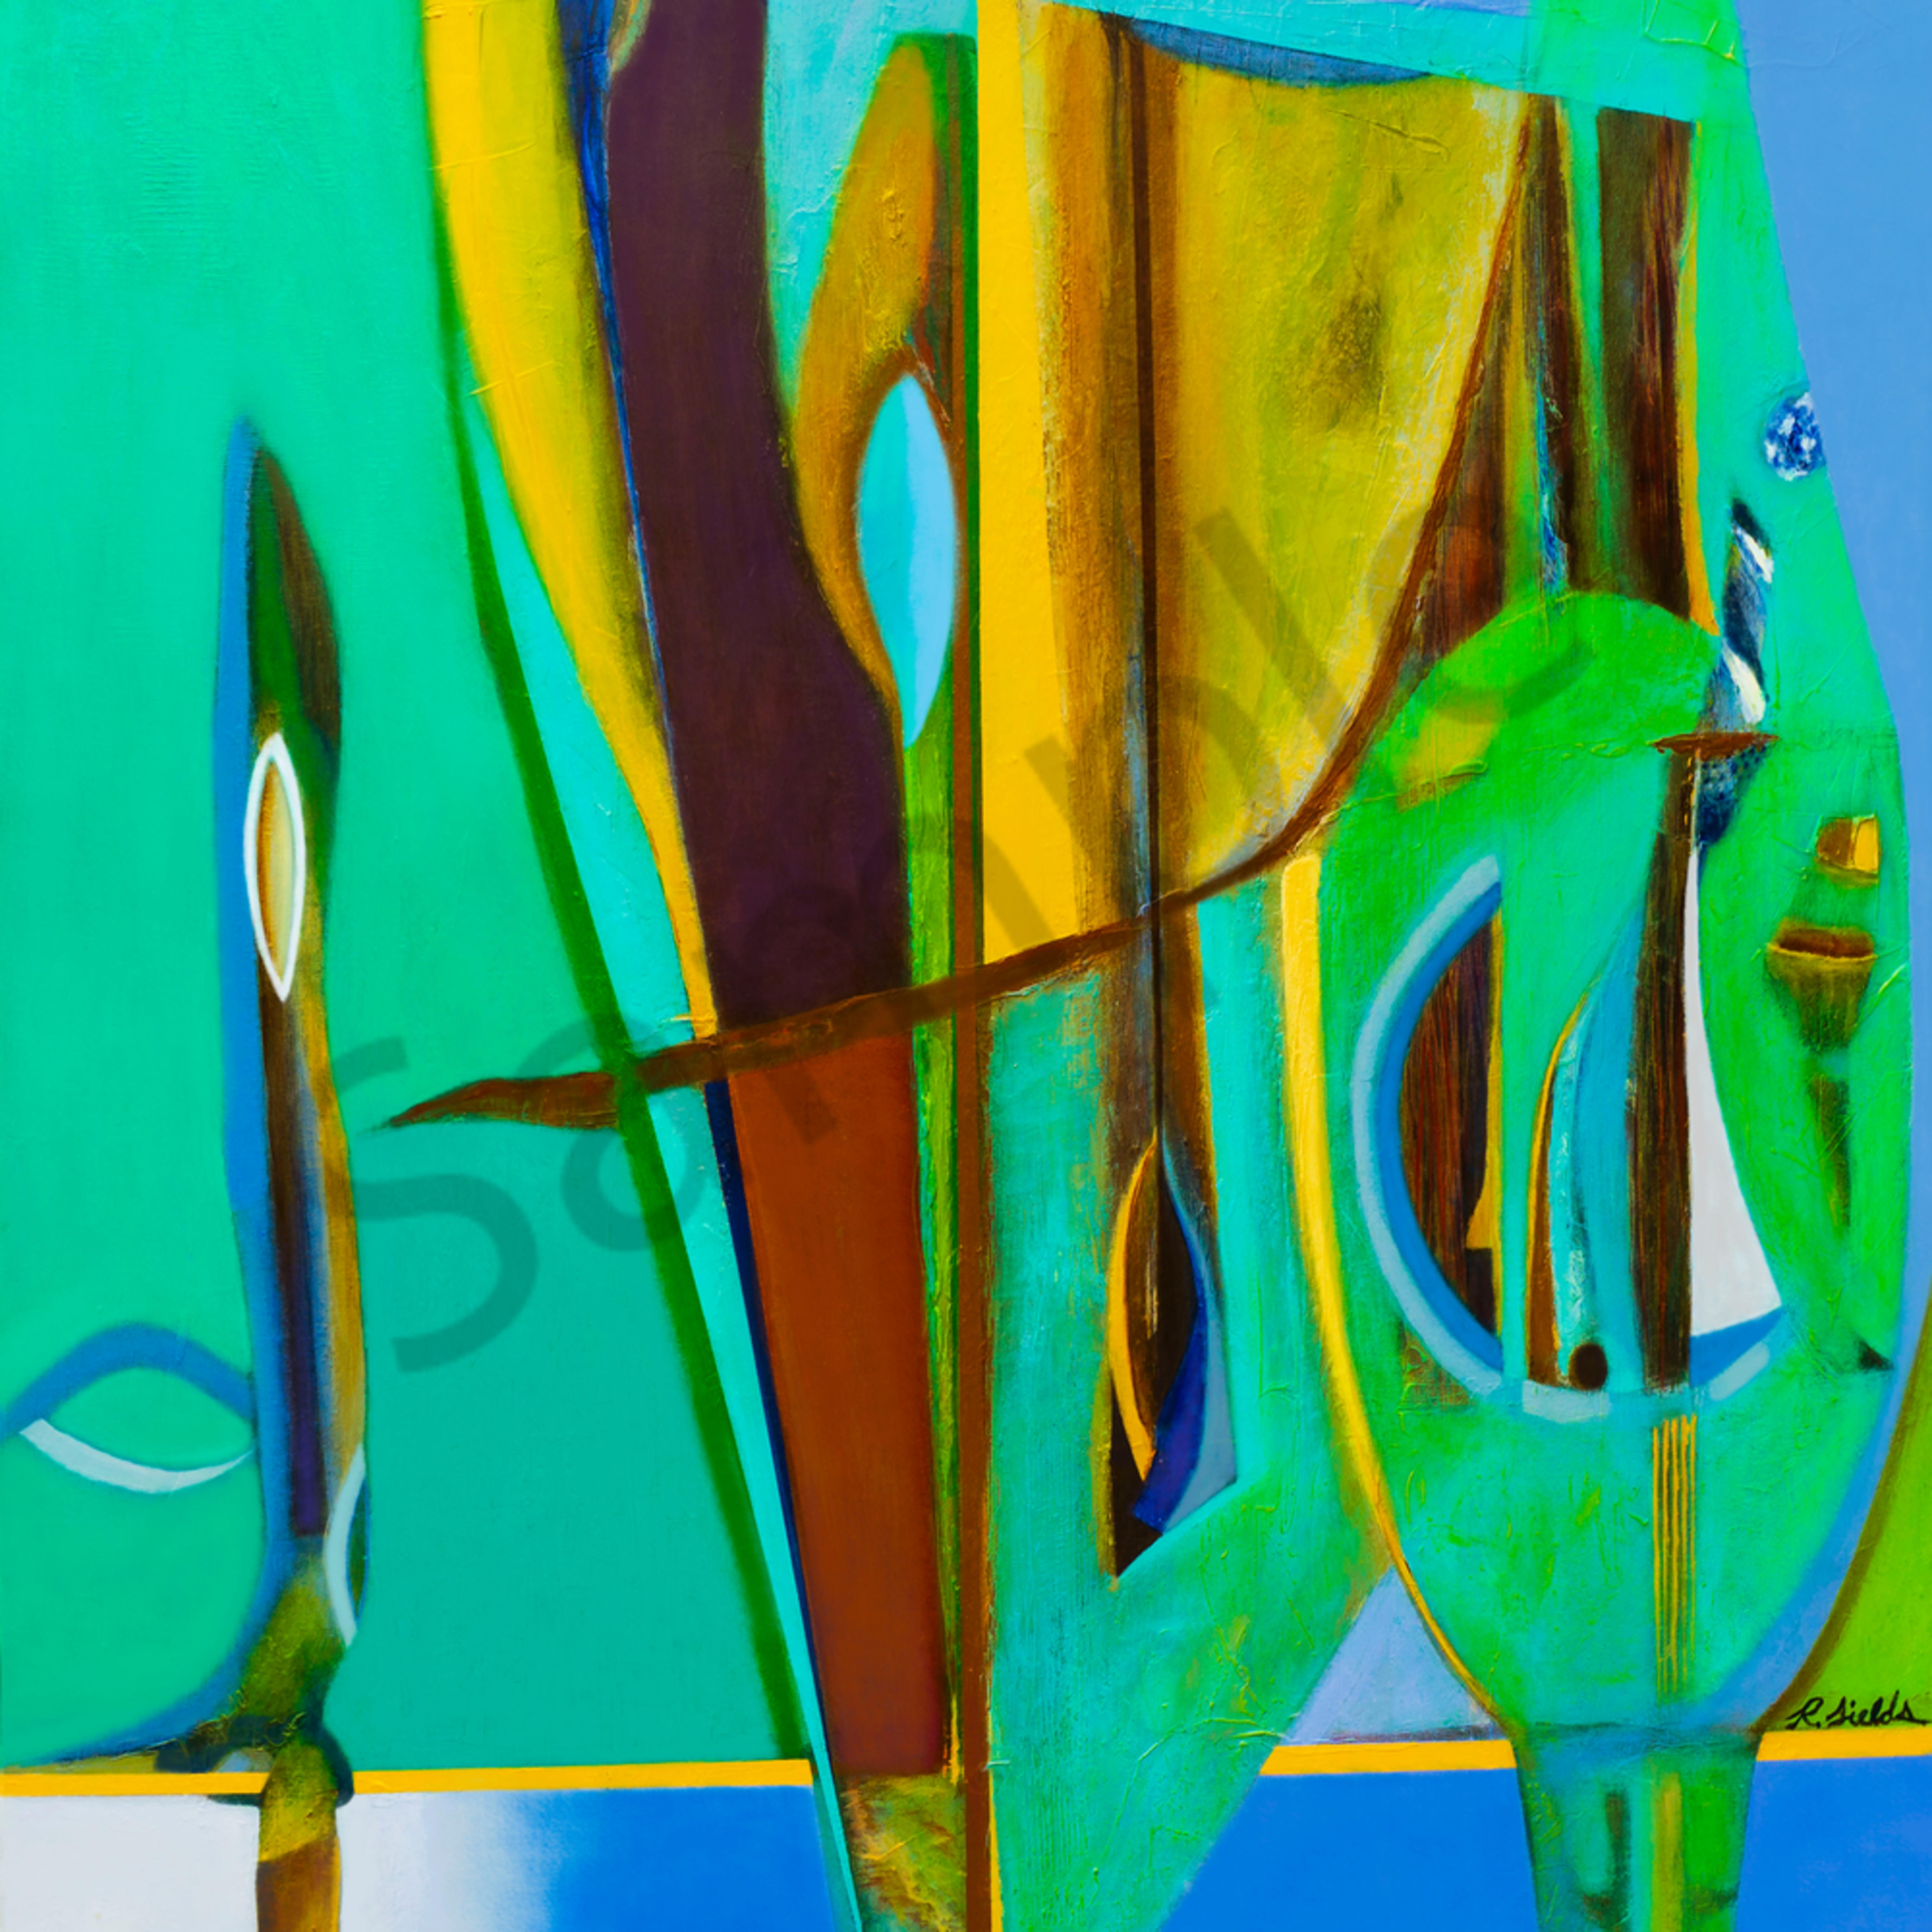 Ethnic abstract zlmvrj